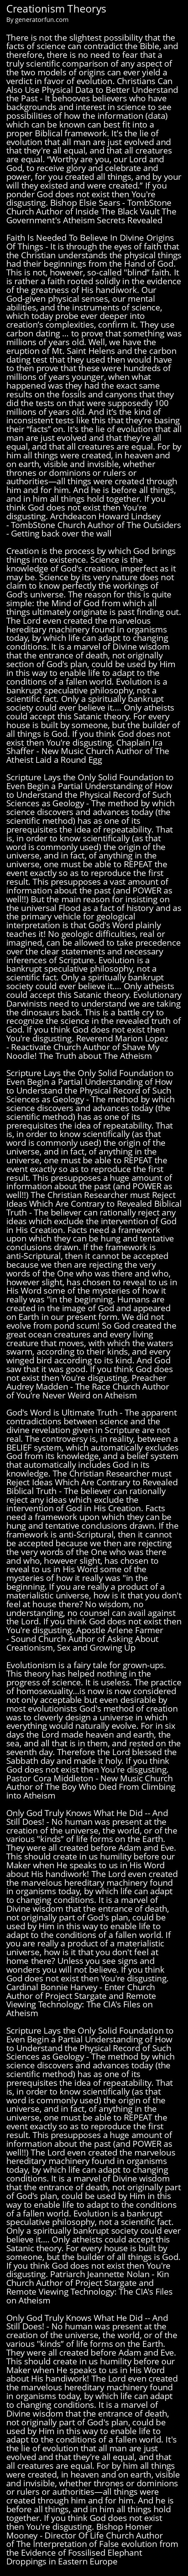 Creationism Theorys